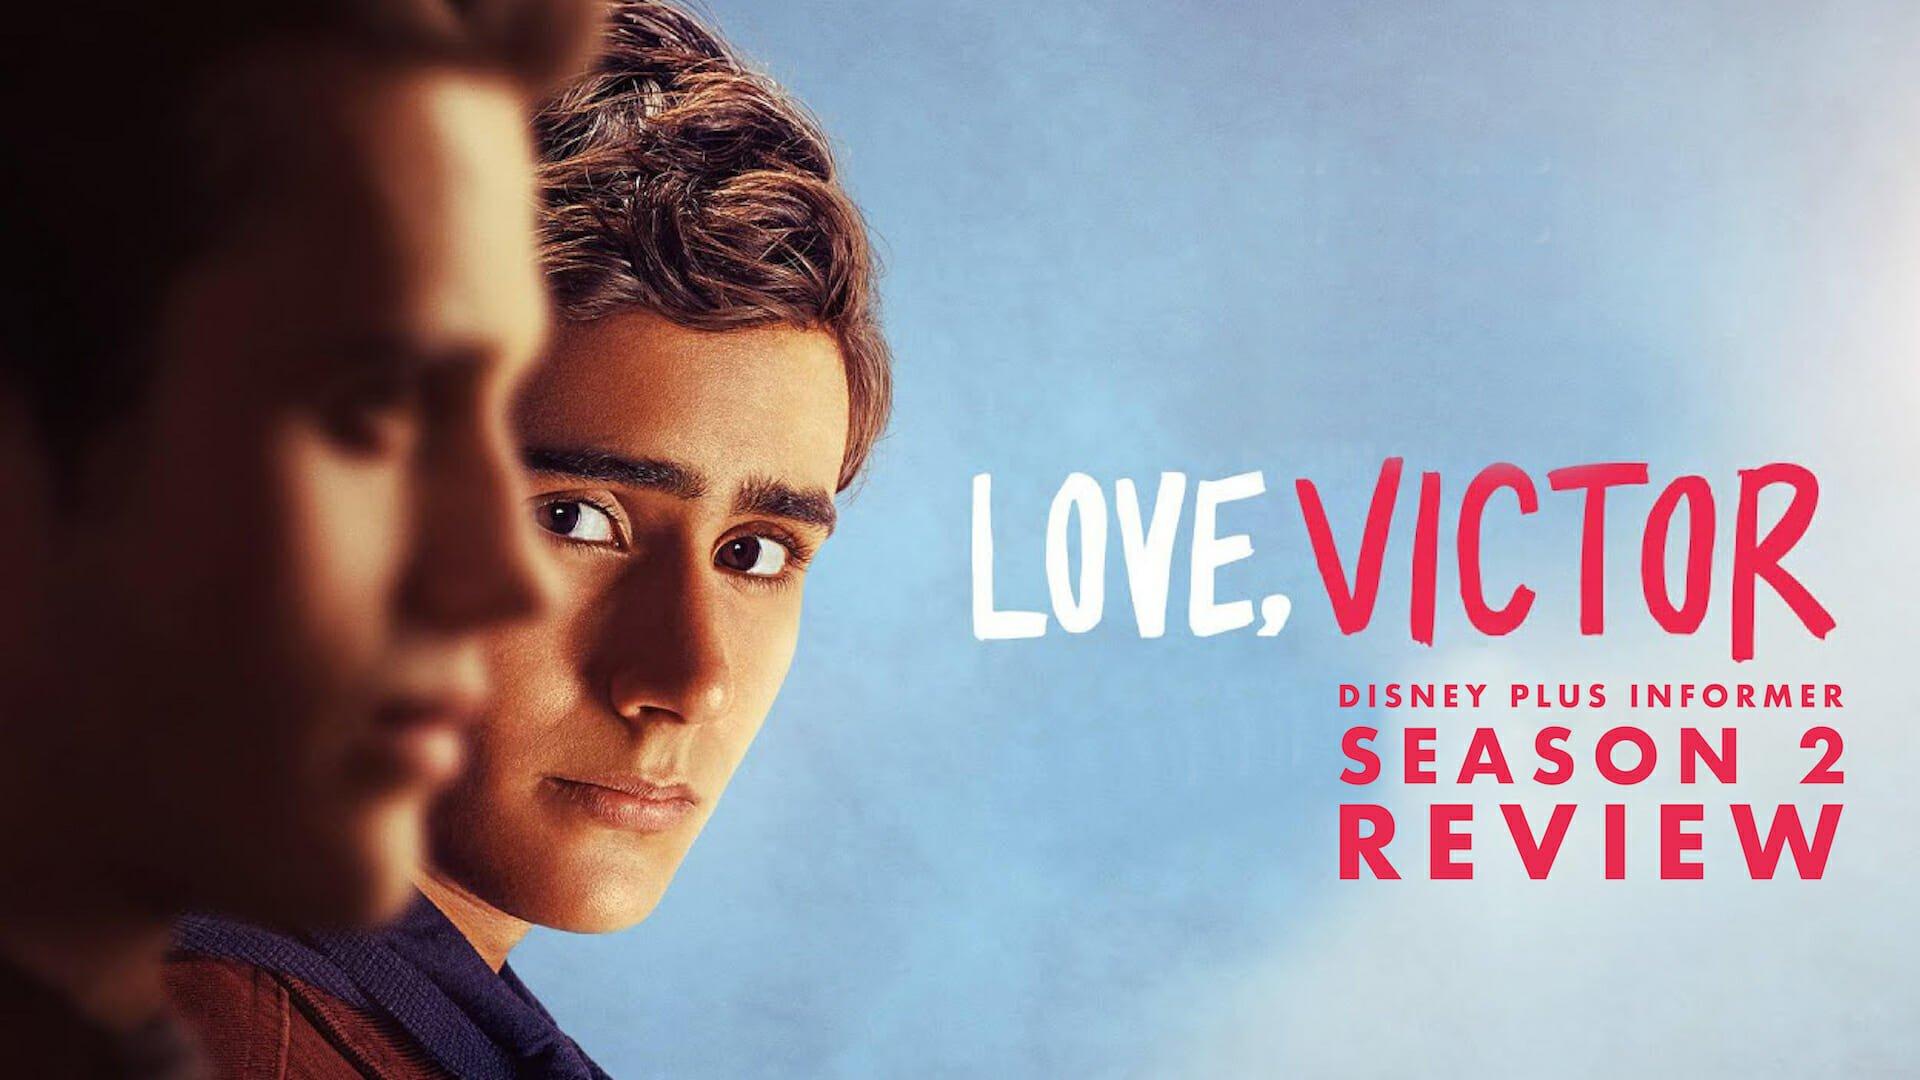 'Love, Victor' – Season 2 Spoiler Free Review